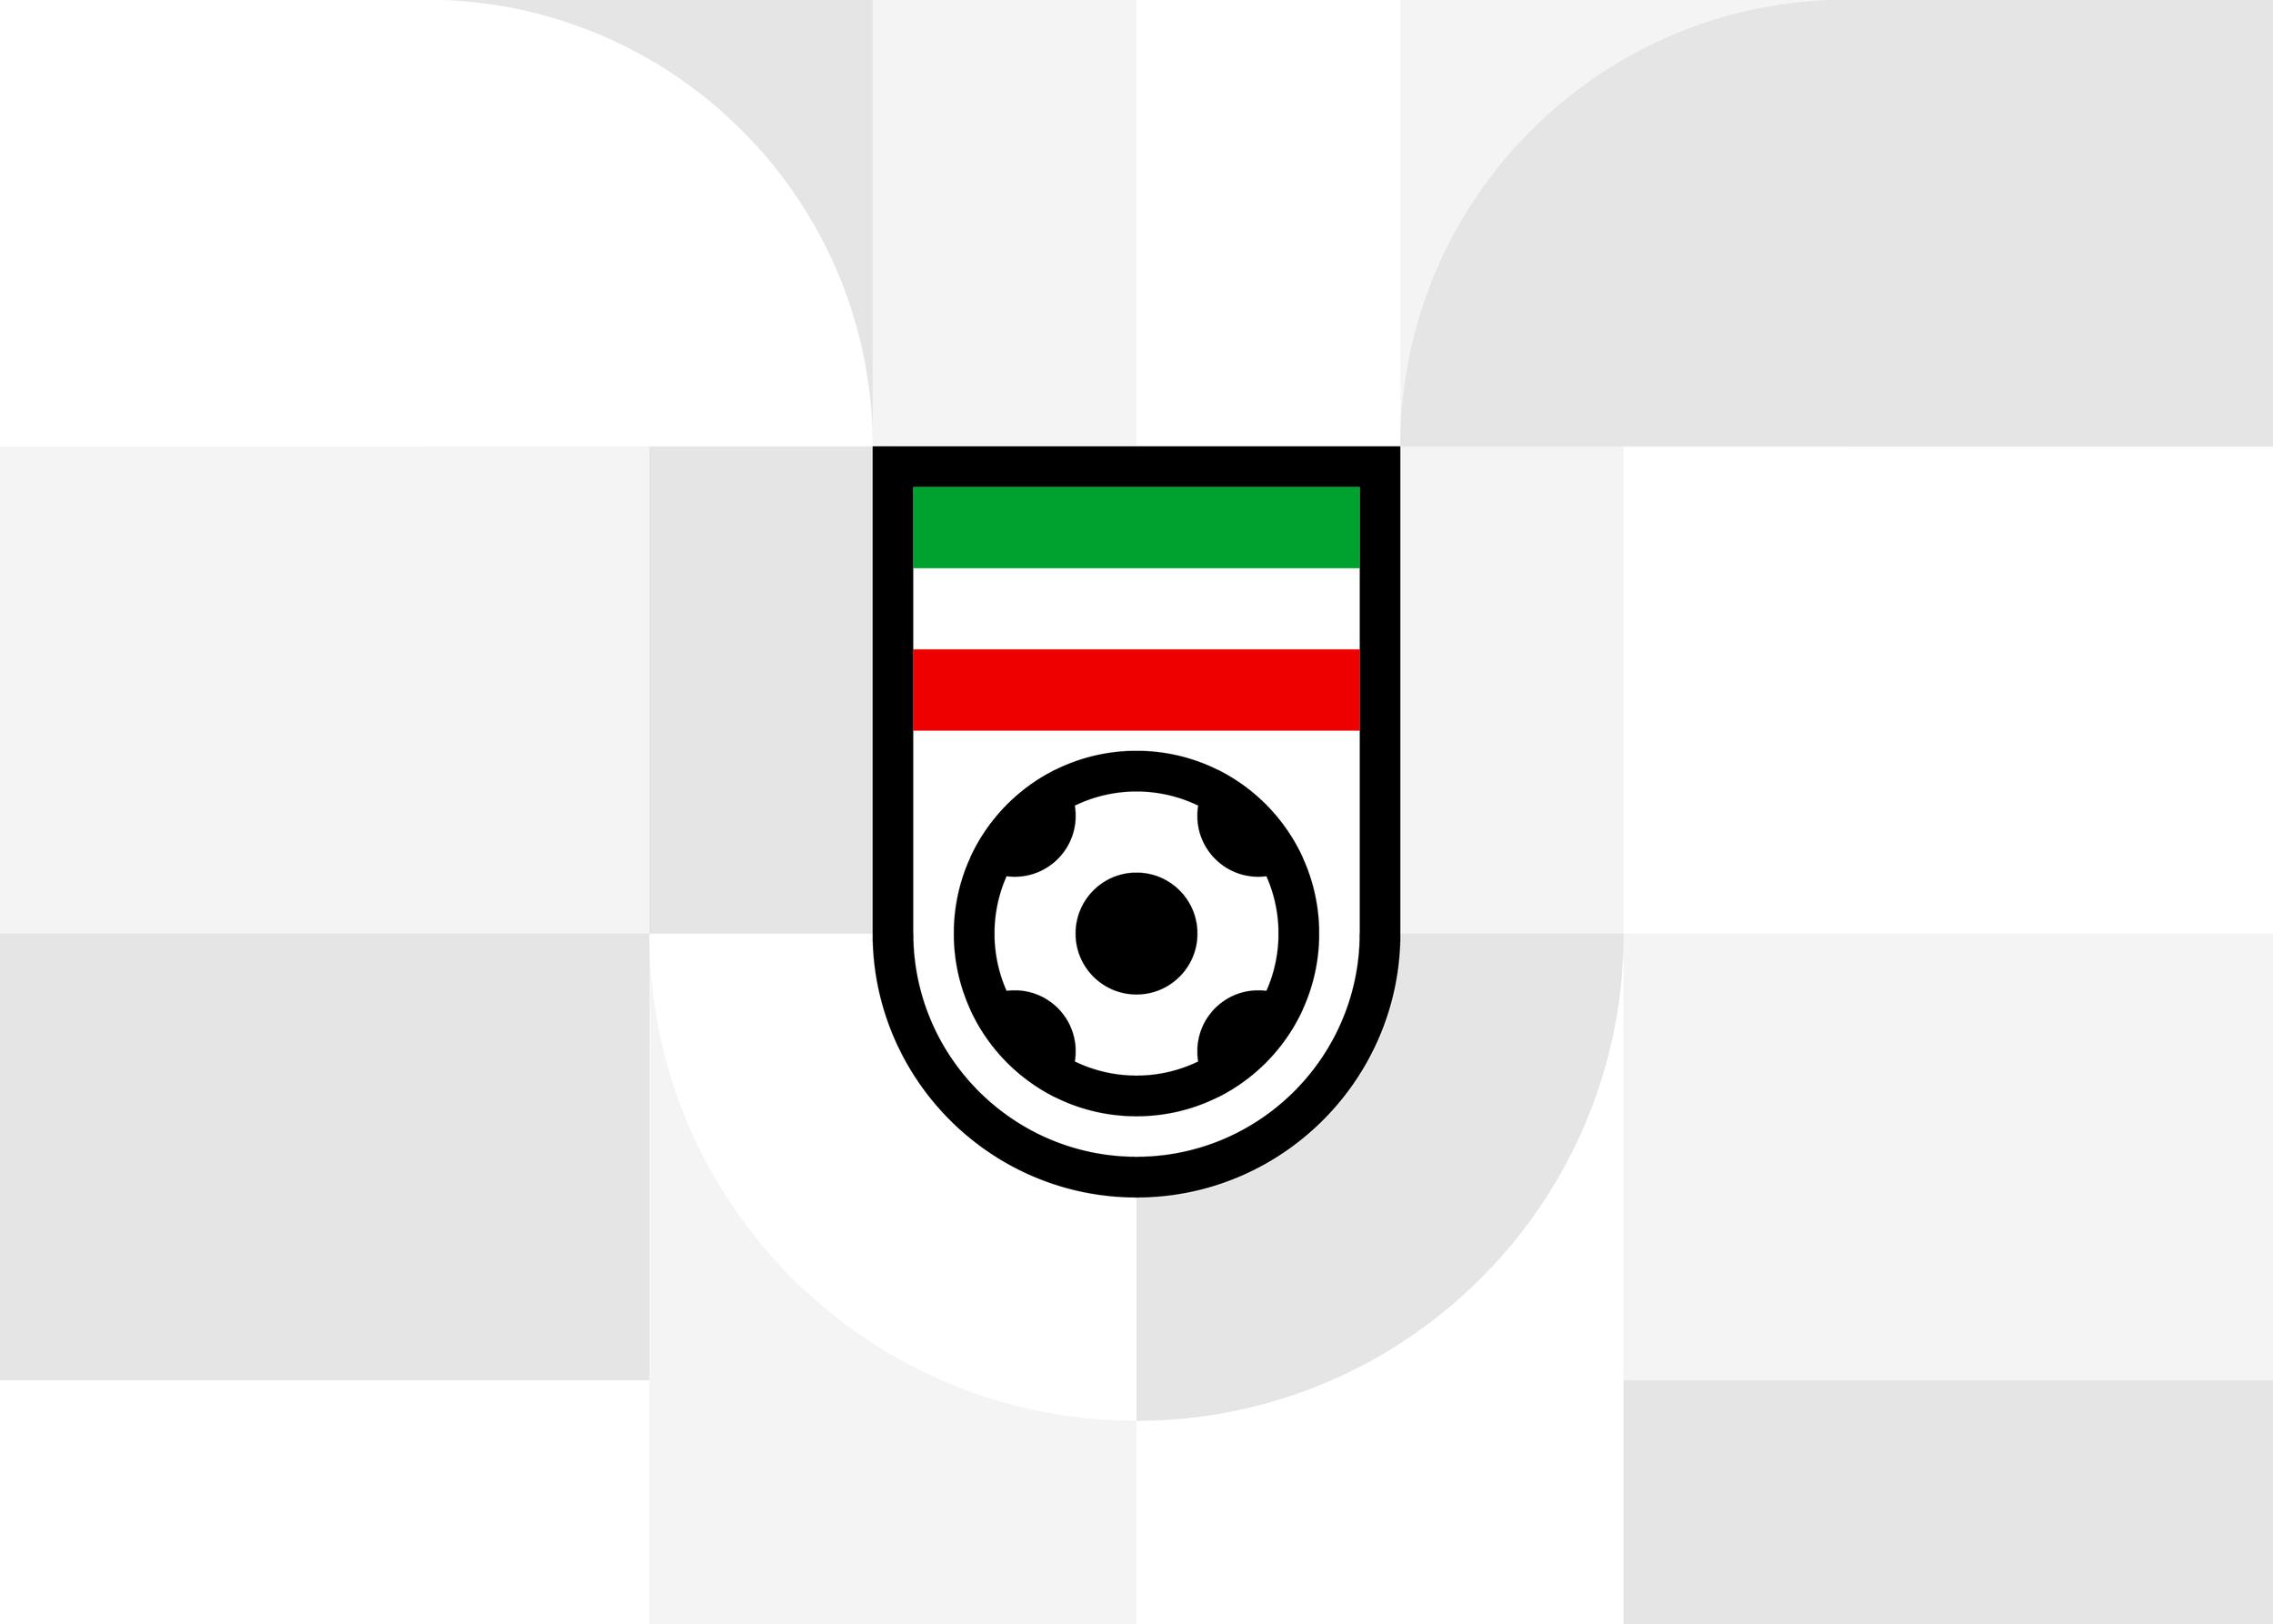 Iran-Geometric-World-Cup-Football-Badge-01-Logo-Design-Freelance-Kent.png